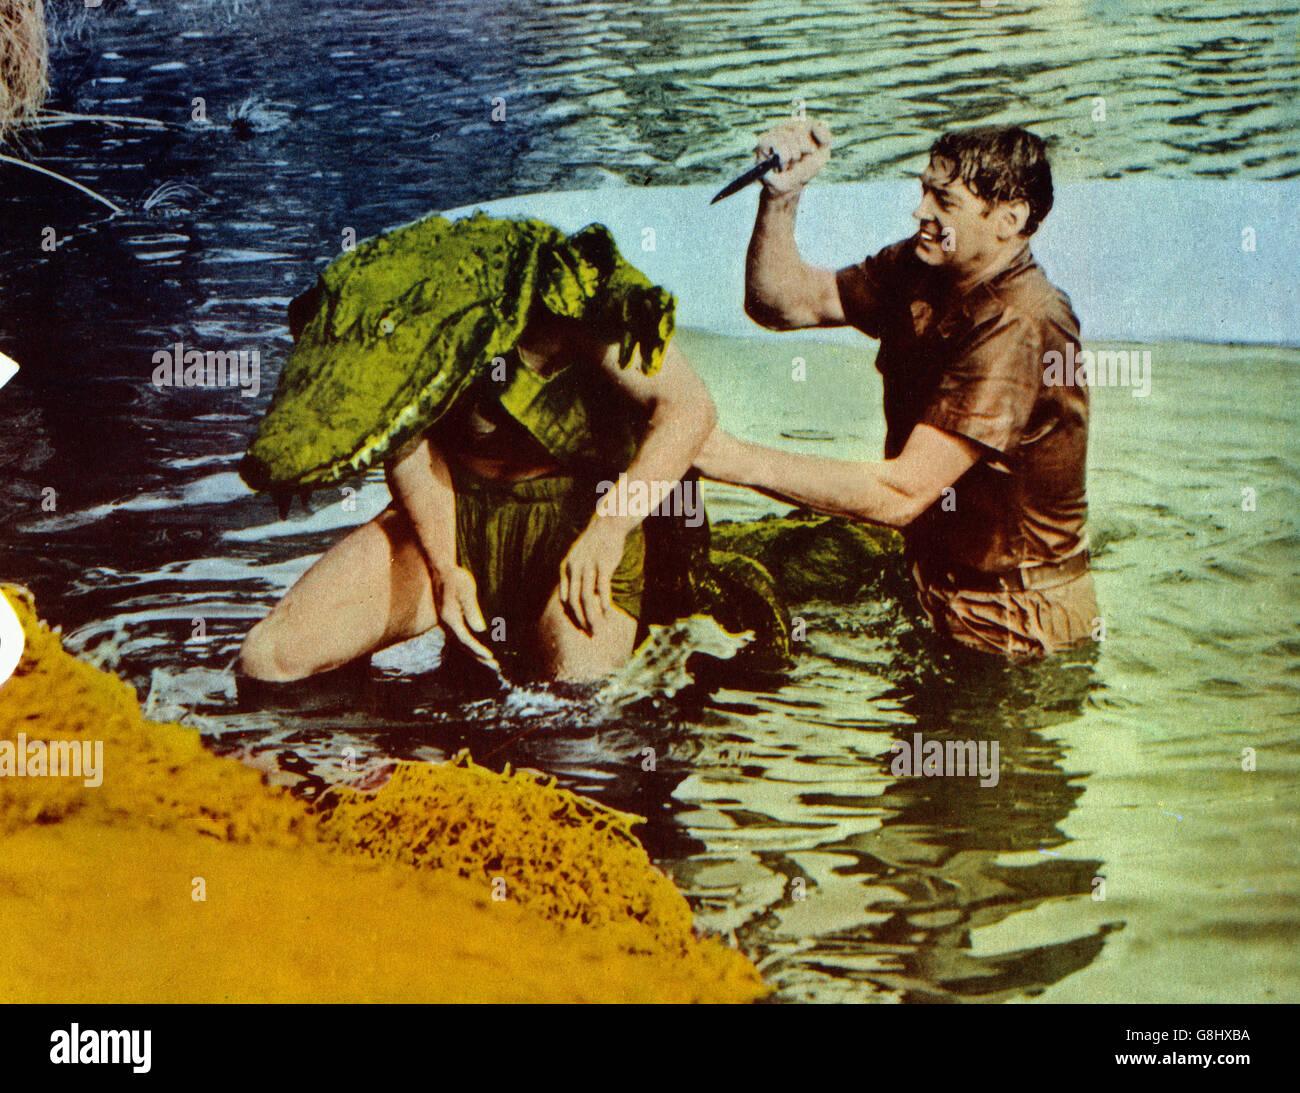 Cannibal Attack, USA 1954, Regie: Lee Sholem, Darsteller: Johnny Weissmuller - Stock Image